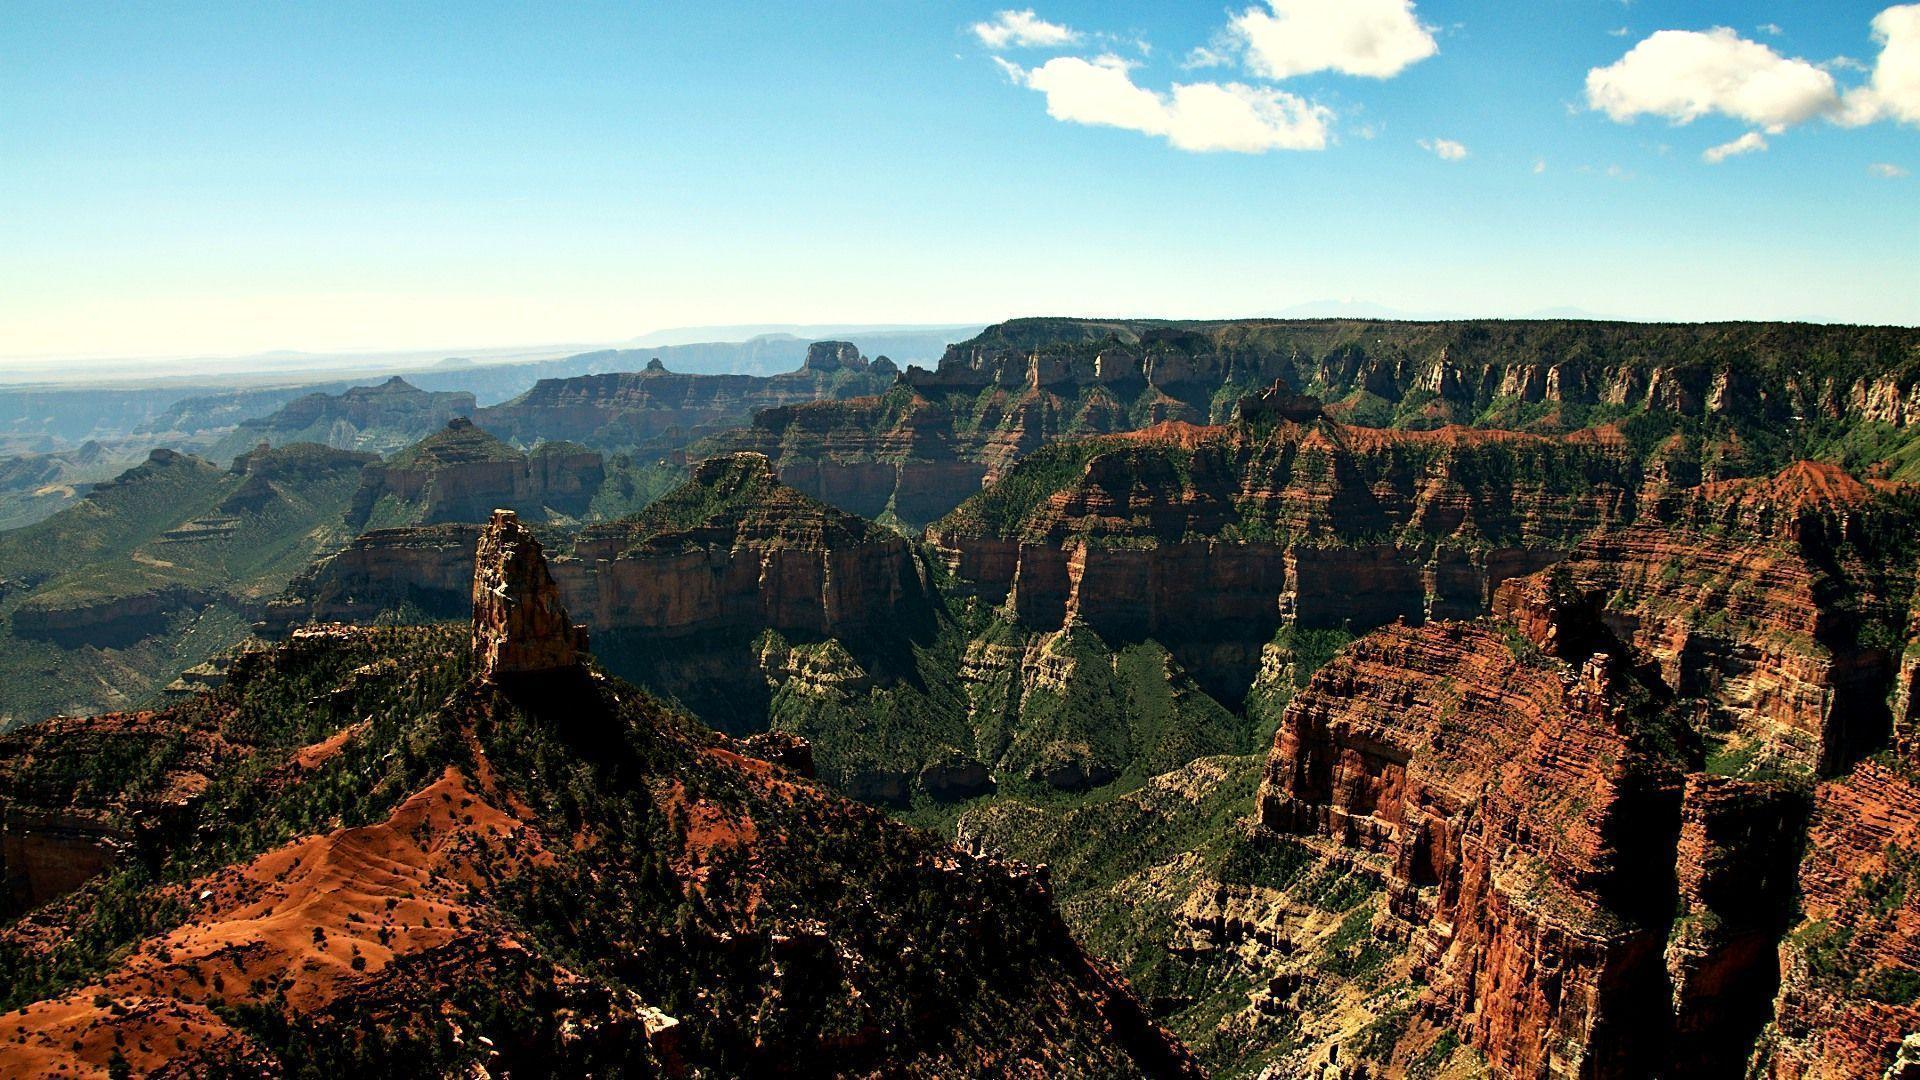 grand canyon 1920x1080 wallpaper - photo #22